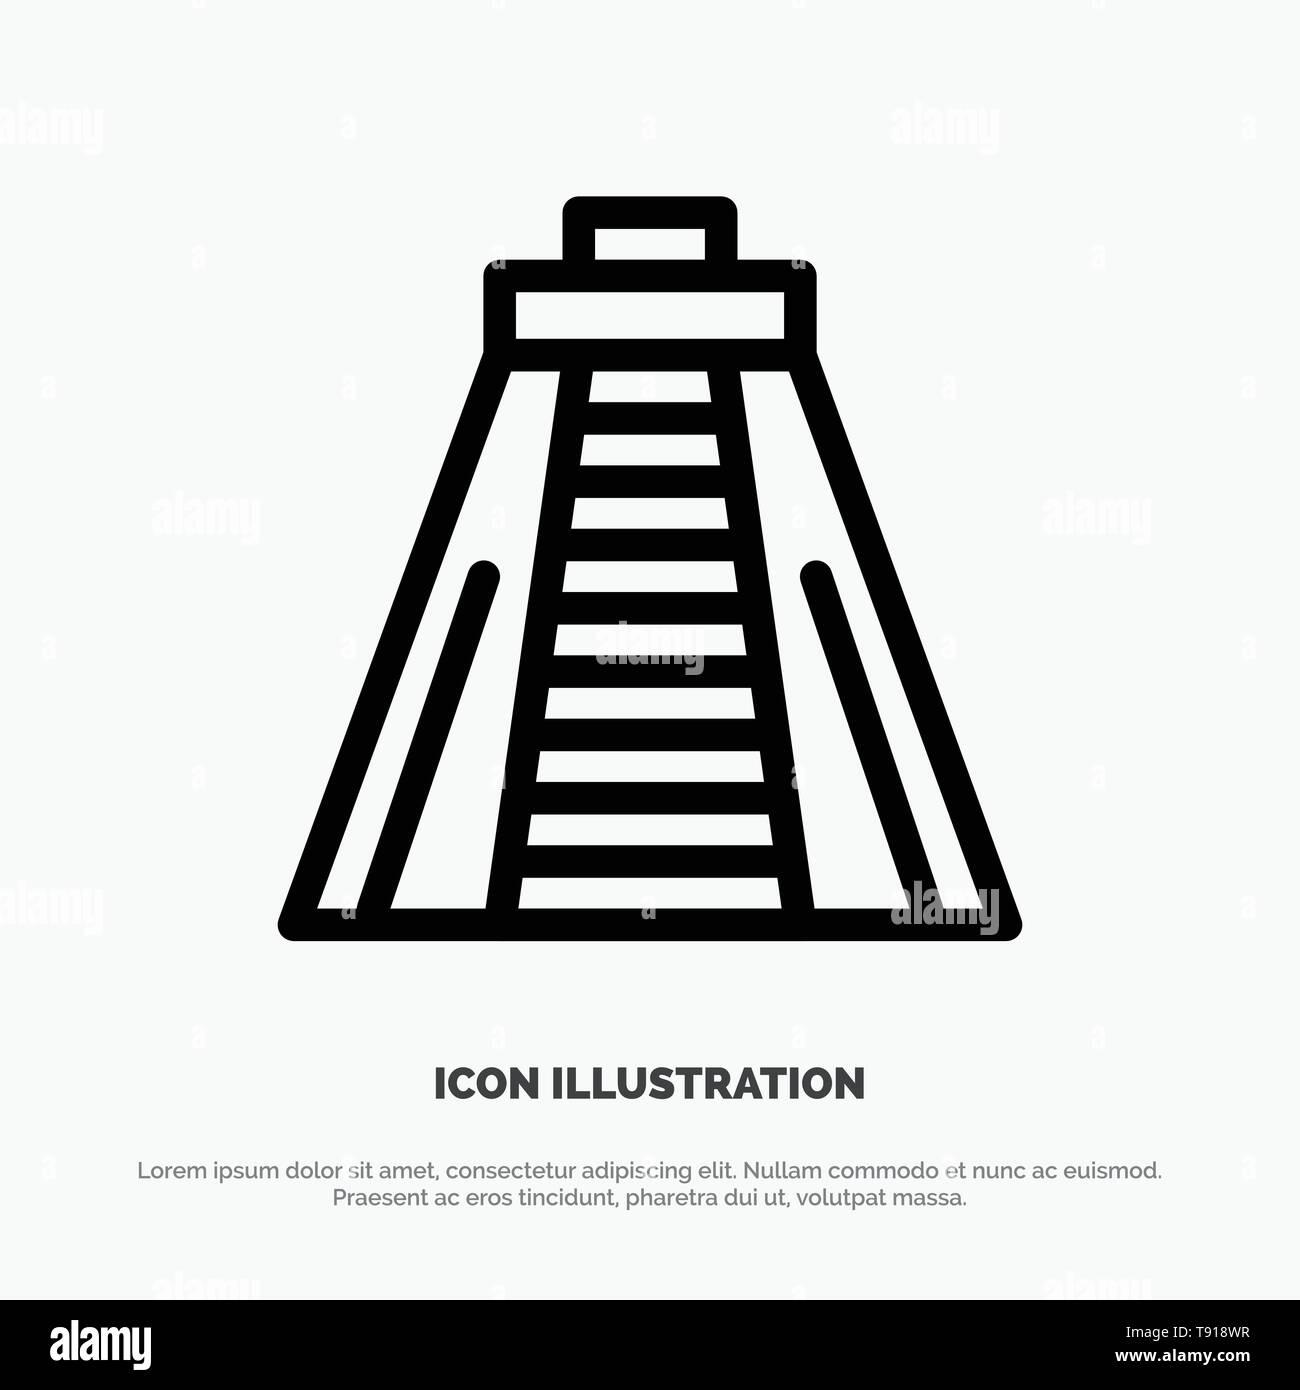 Chichen Itza, Landmark, Monument Vector Line Icon - Stock Image